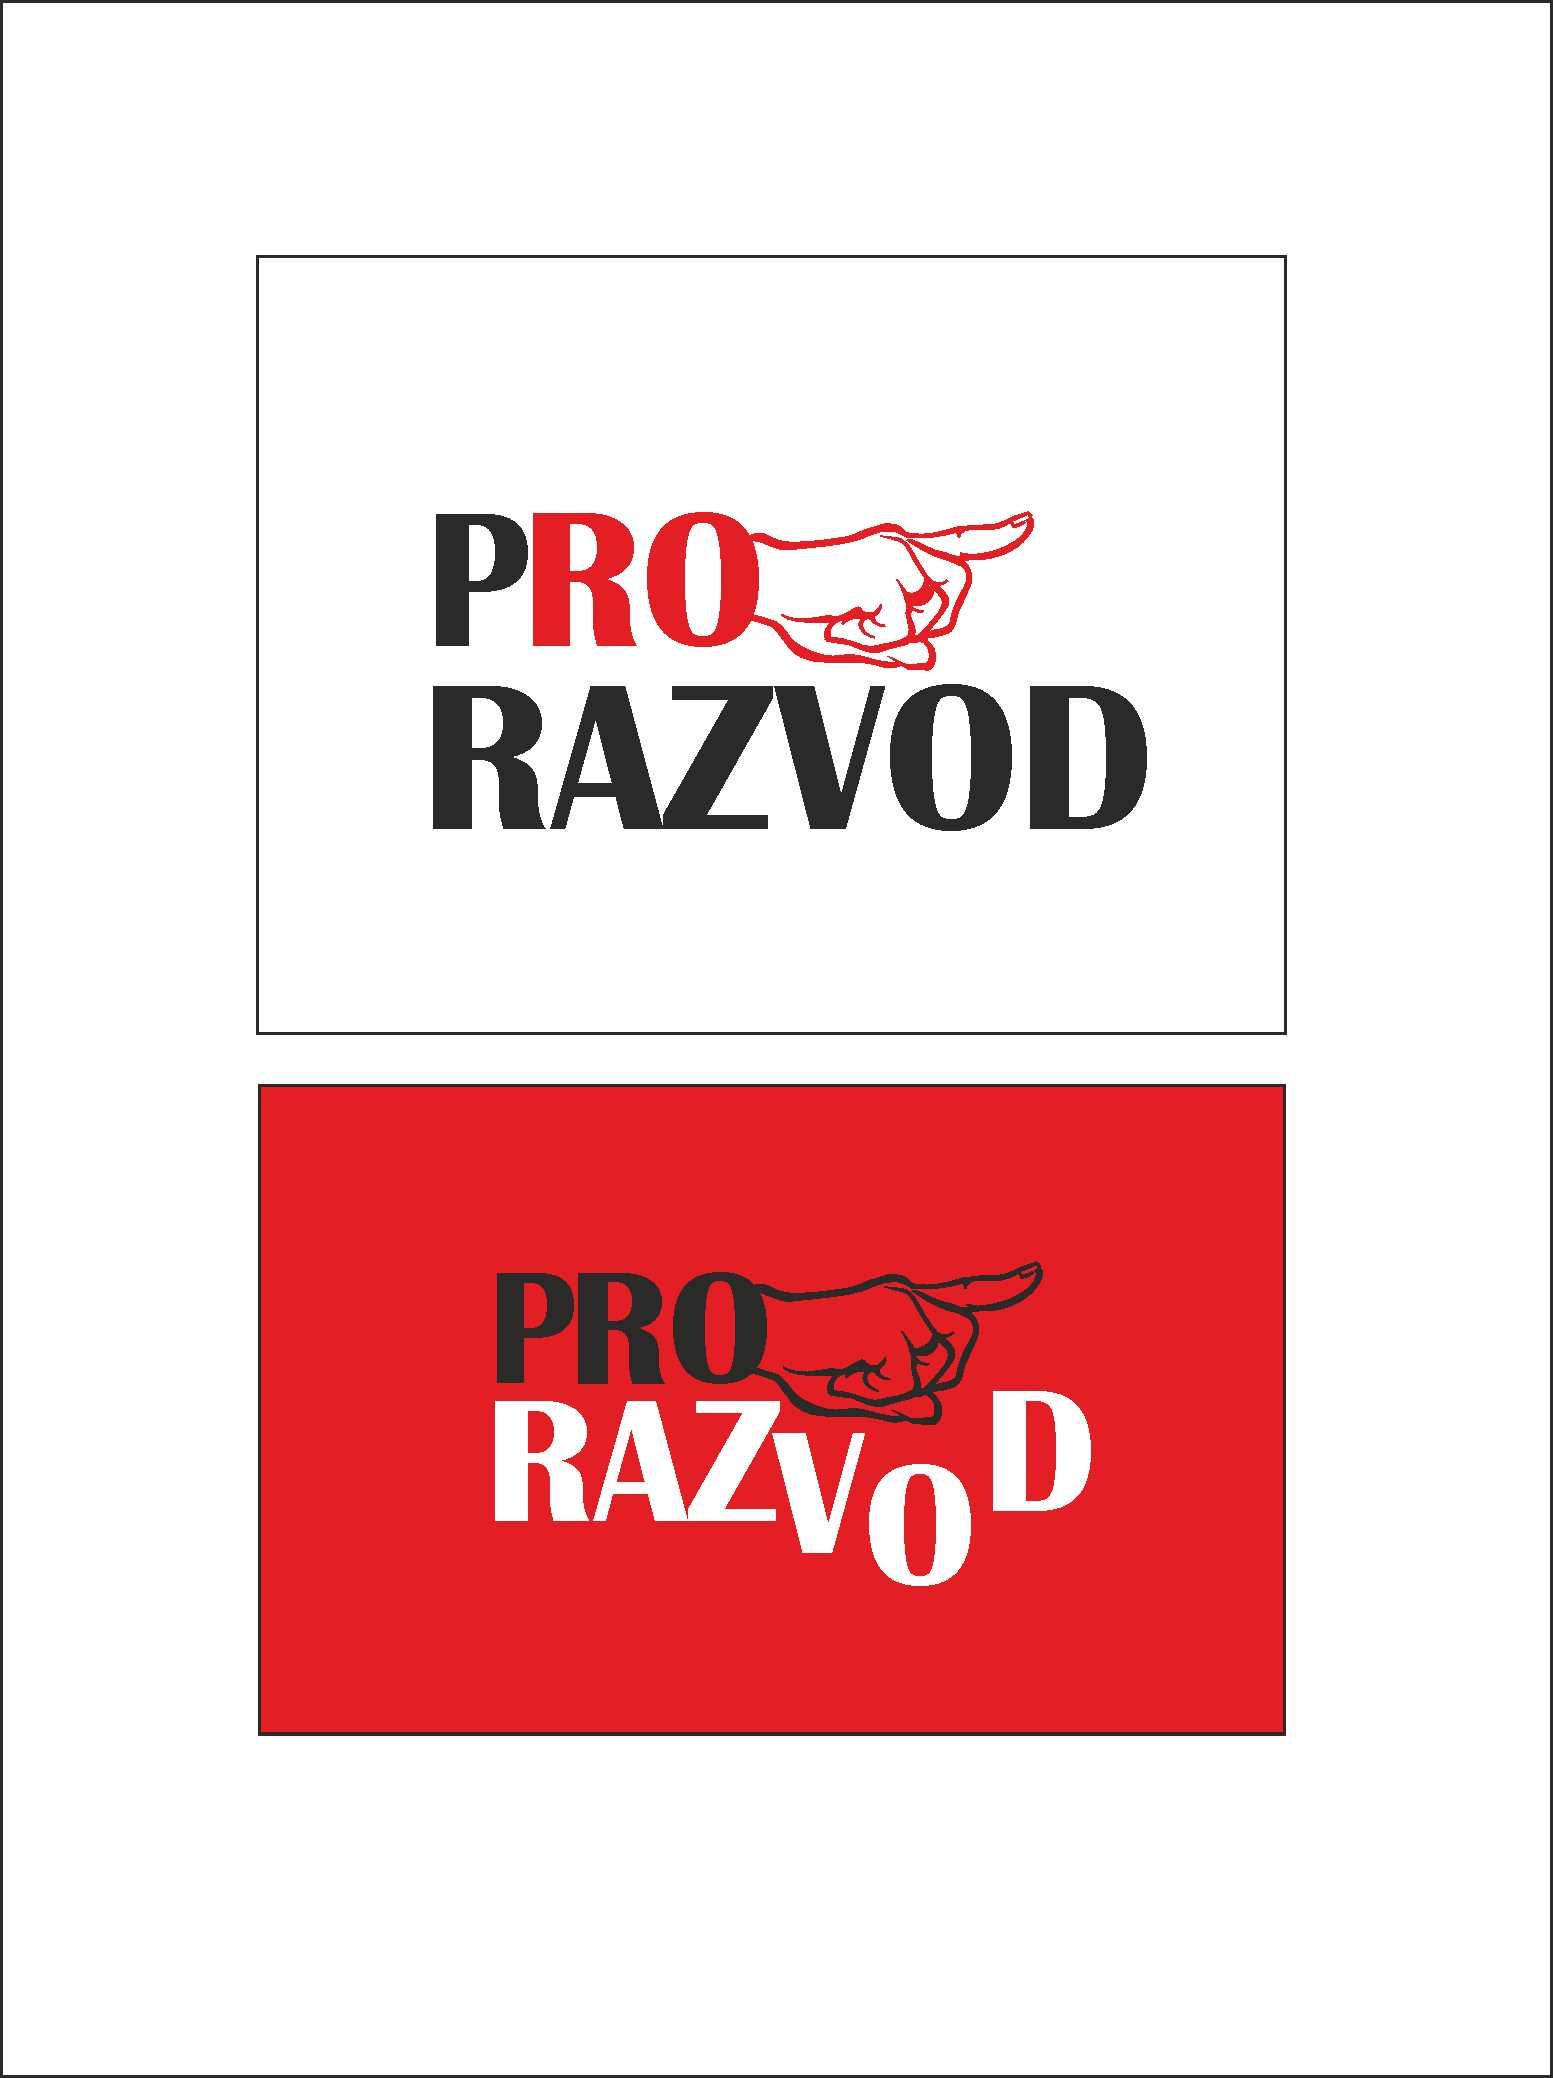 Логотип и фирм стиль для бракоразводного агенства. фото f_1465875f51ad1d23.jpg